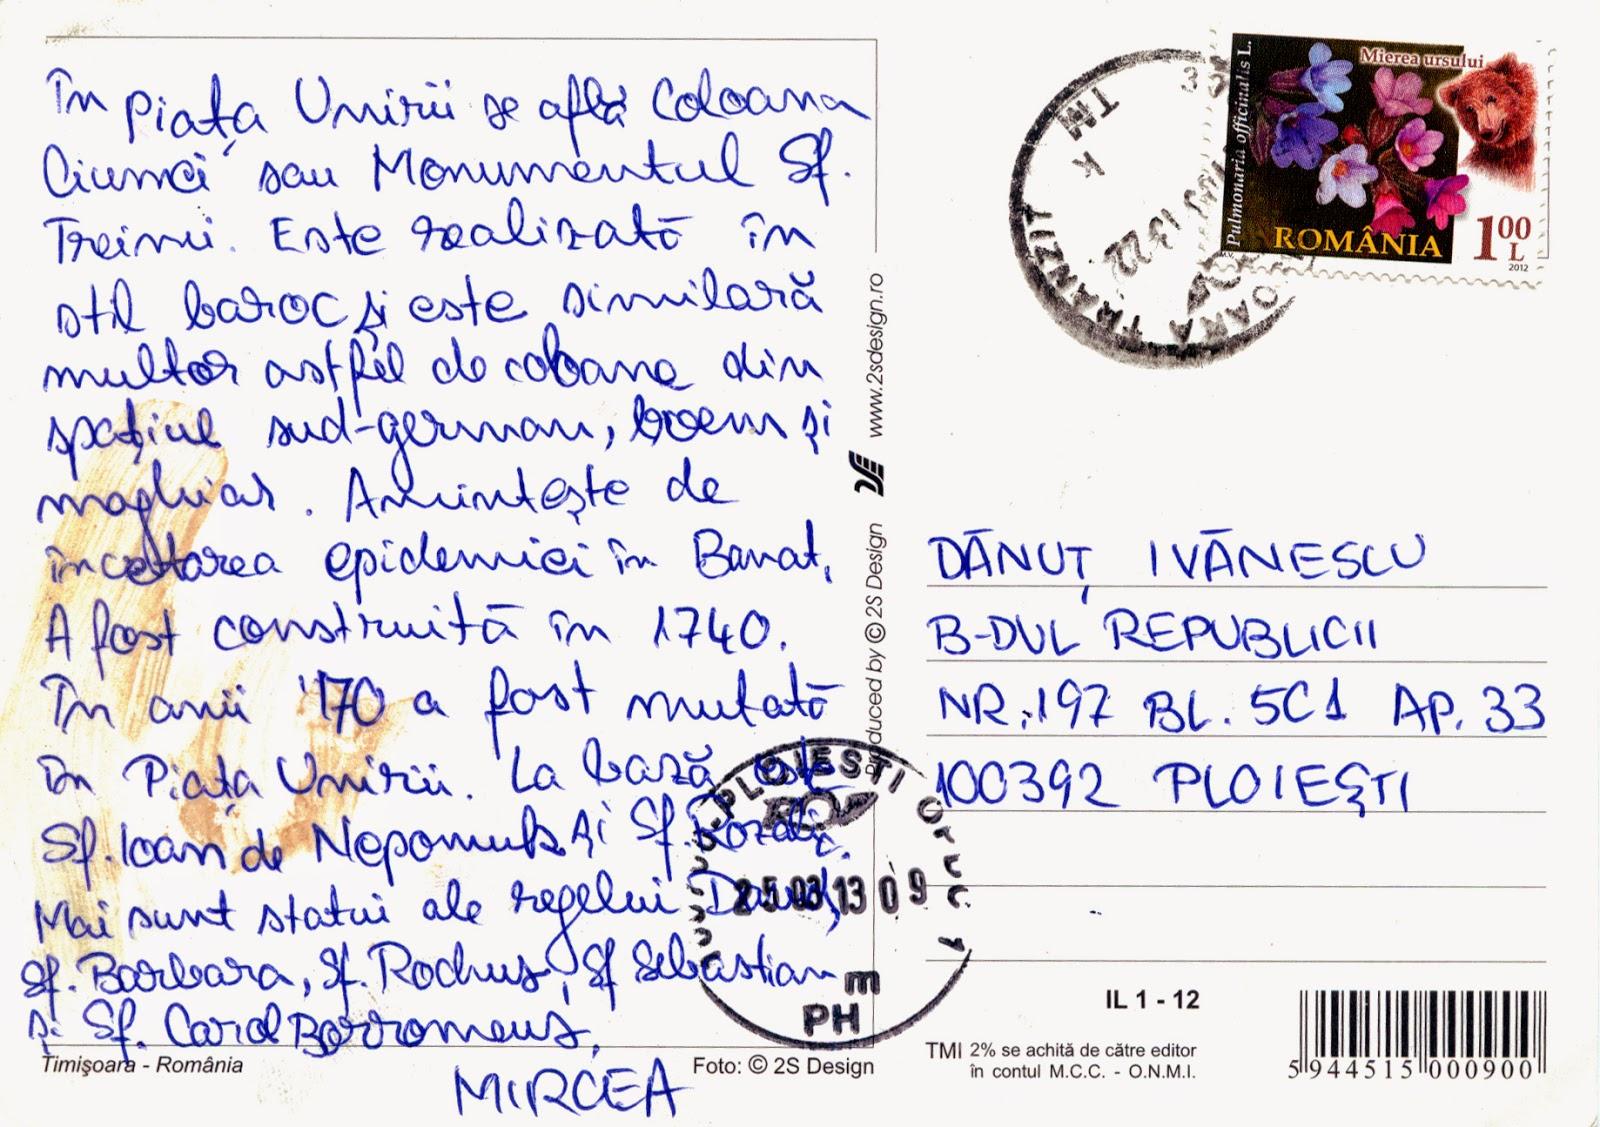 WORLD, COME TO MY HOME!: 1348-1351, 2681, 2682, 3070 ROMANIA